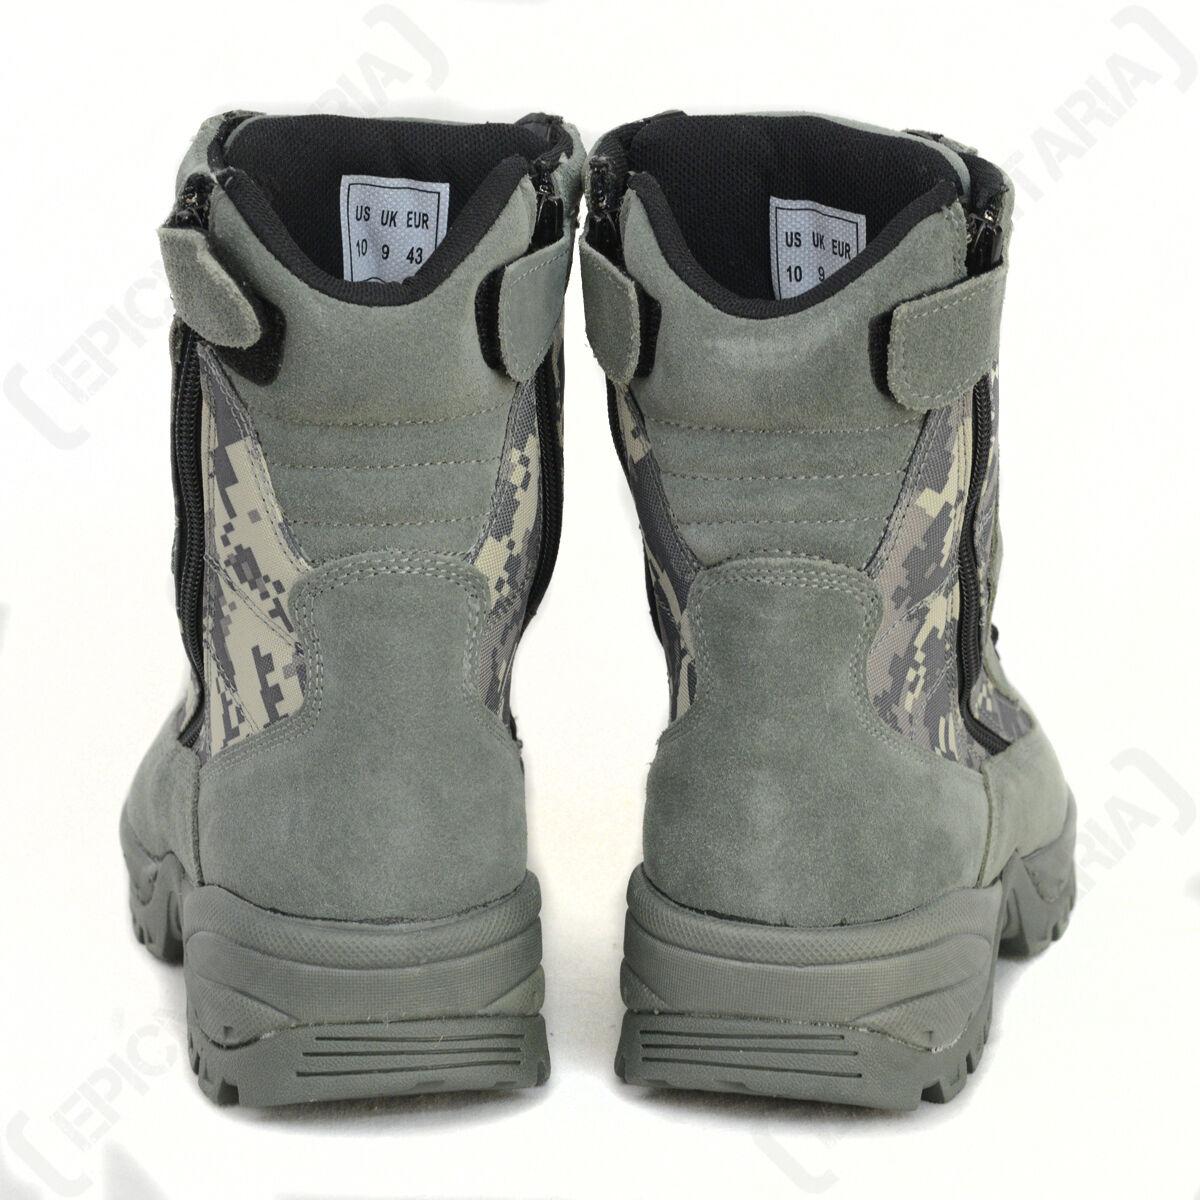 Digital Camuflaje Militares-2 funcional Botas Militares-2 Camuflaje cremalleras-MILITAR AIRSOFT 96df38